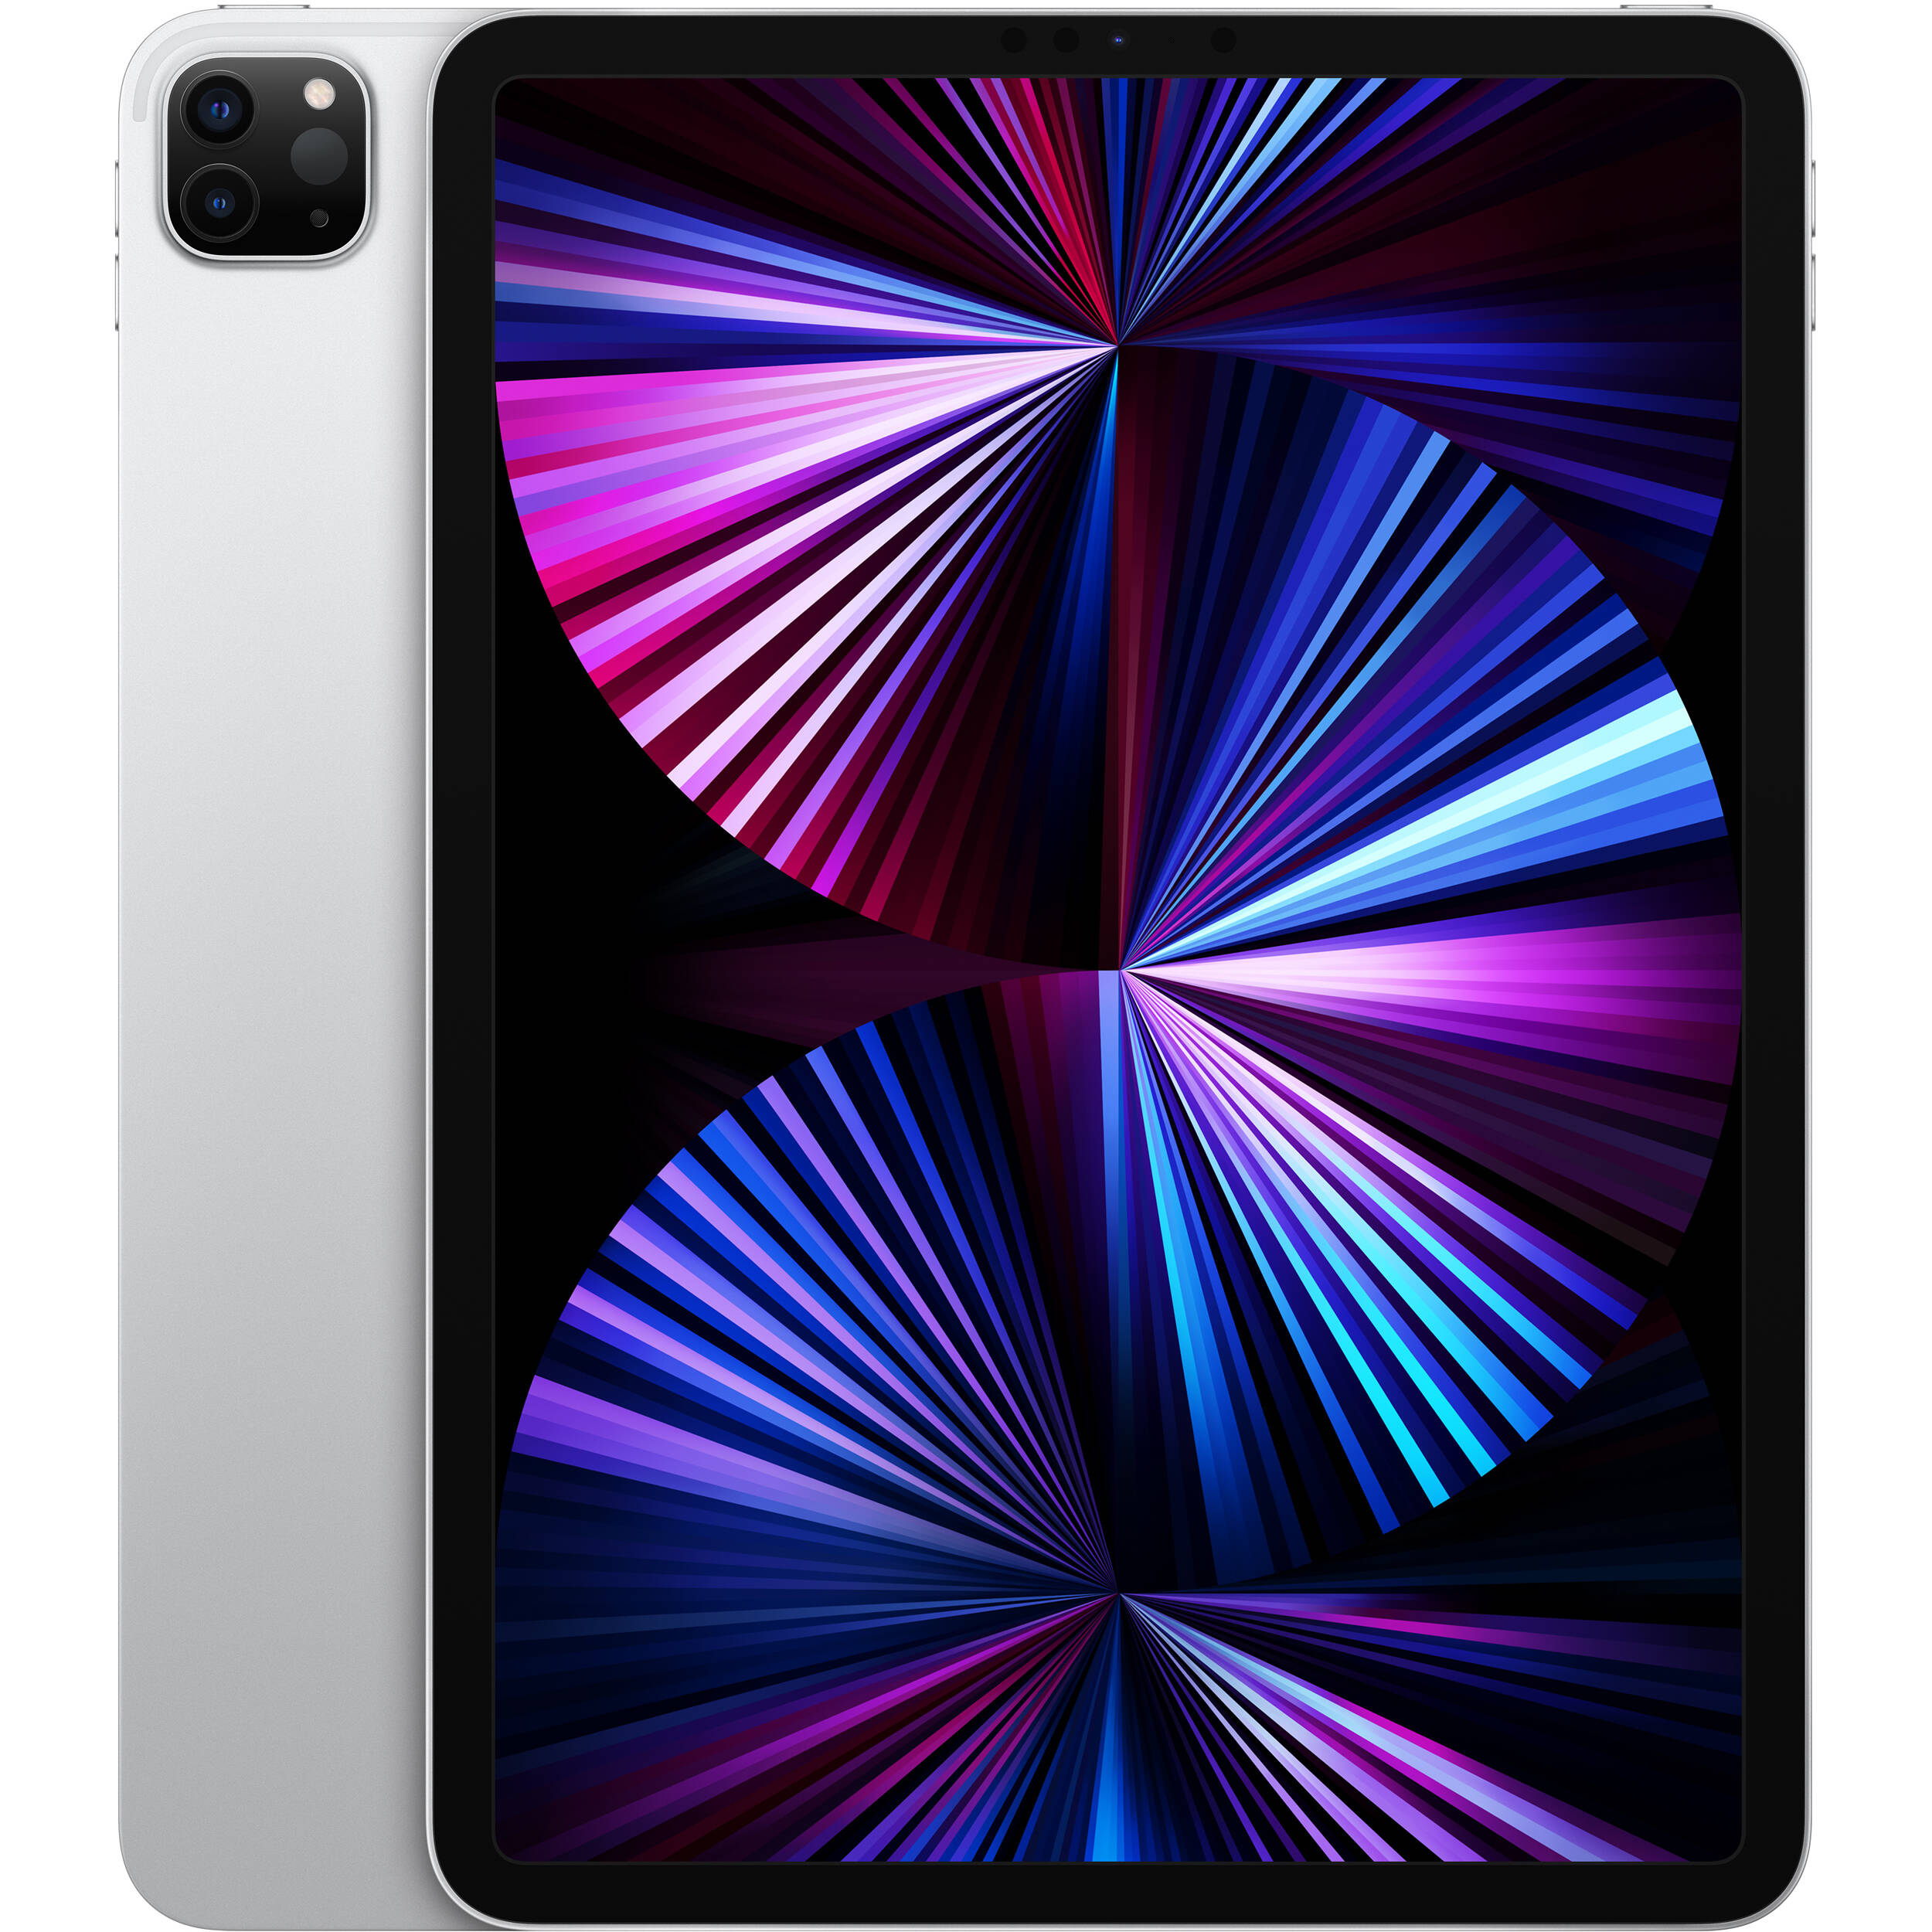 "Apple 11"" iPad Pro M1 Chip MHQX3LL/A B&H Photo Video"